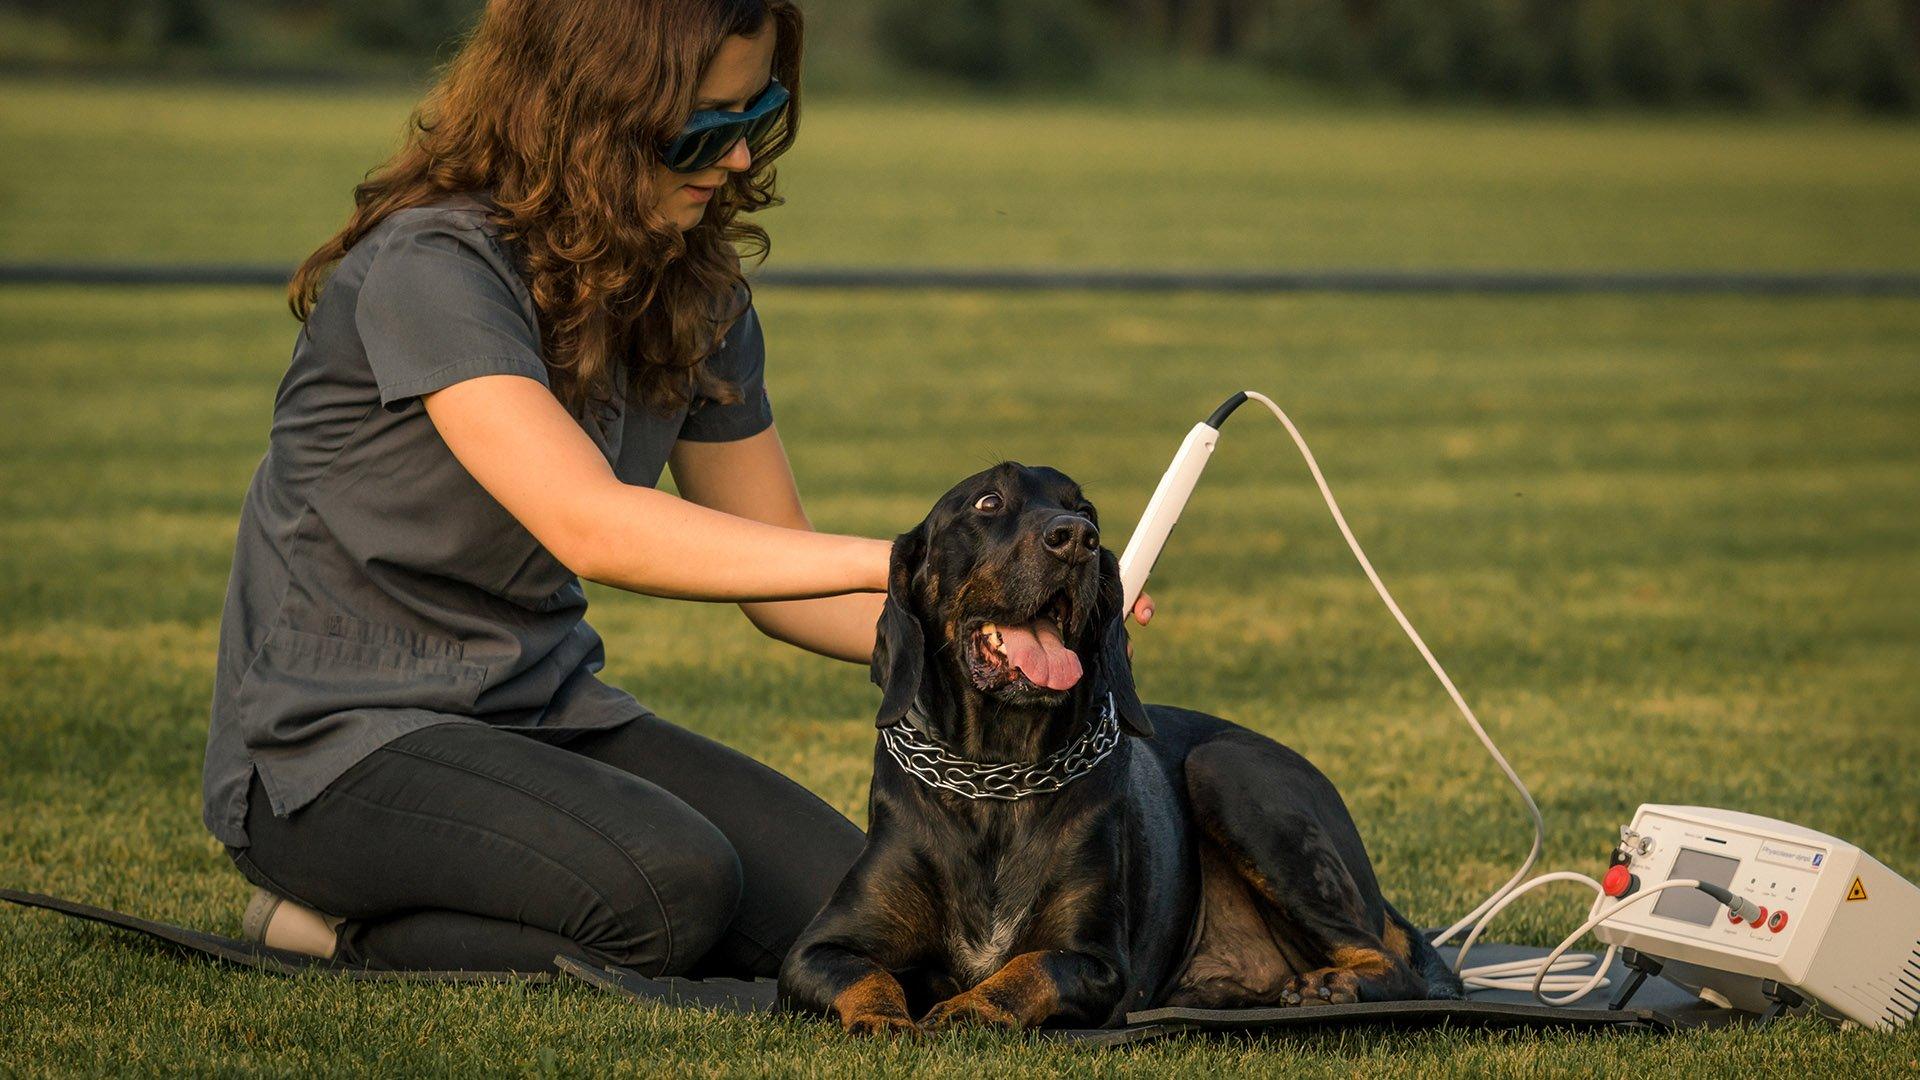 laseroterapia psa laser dla psa warszawa